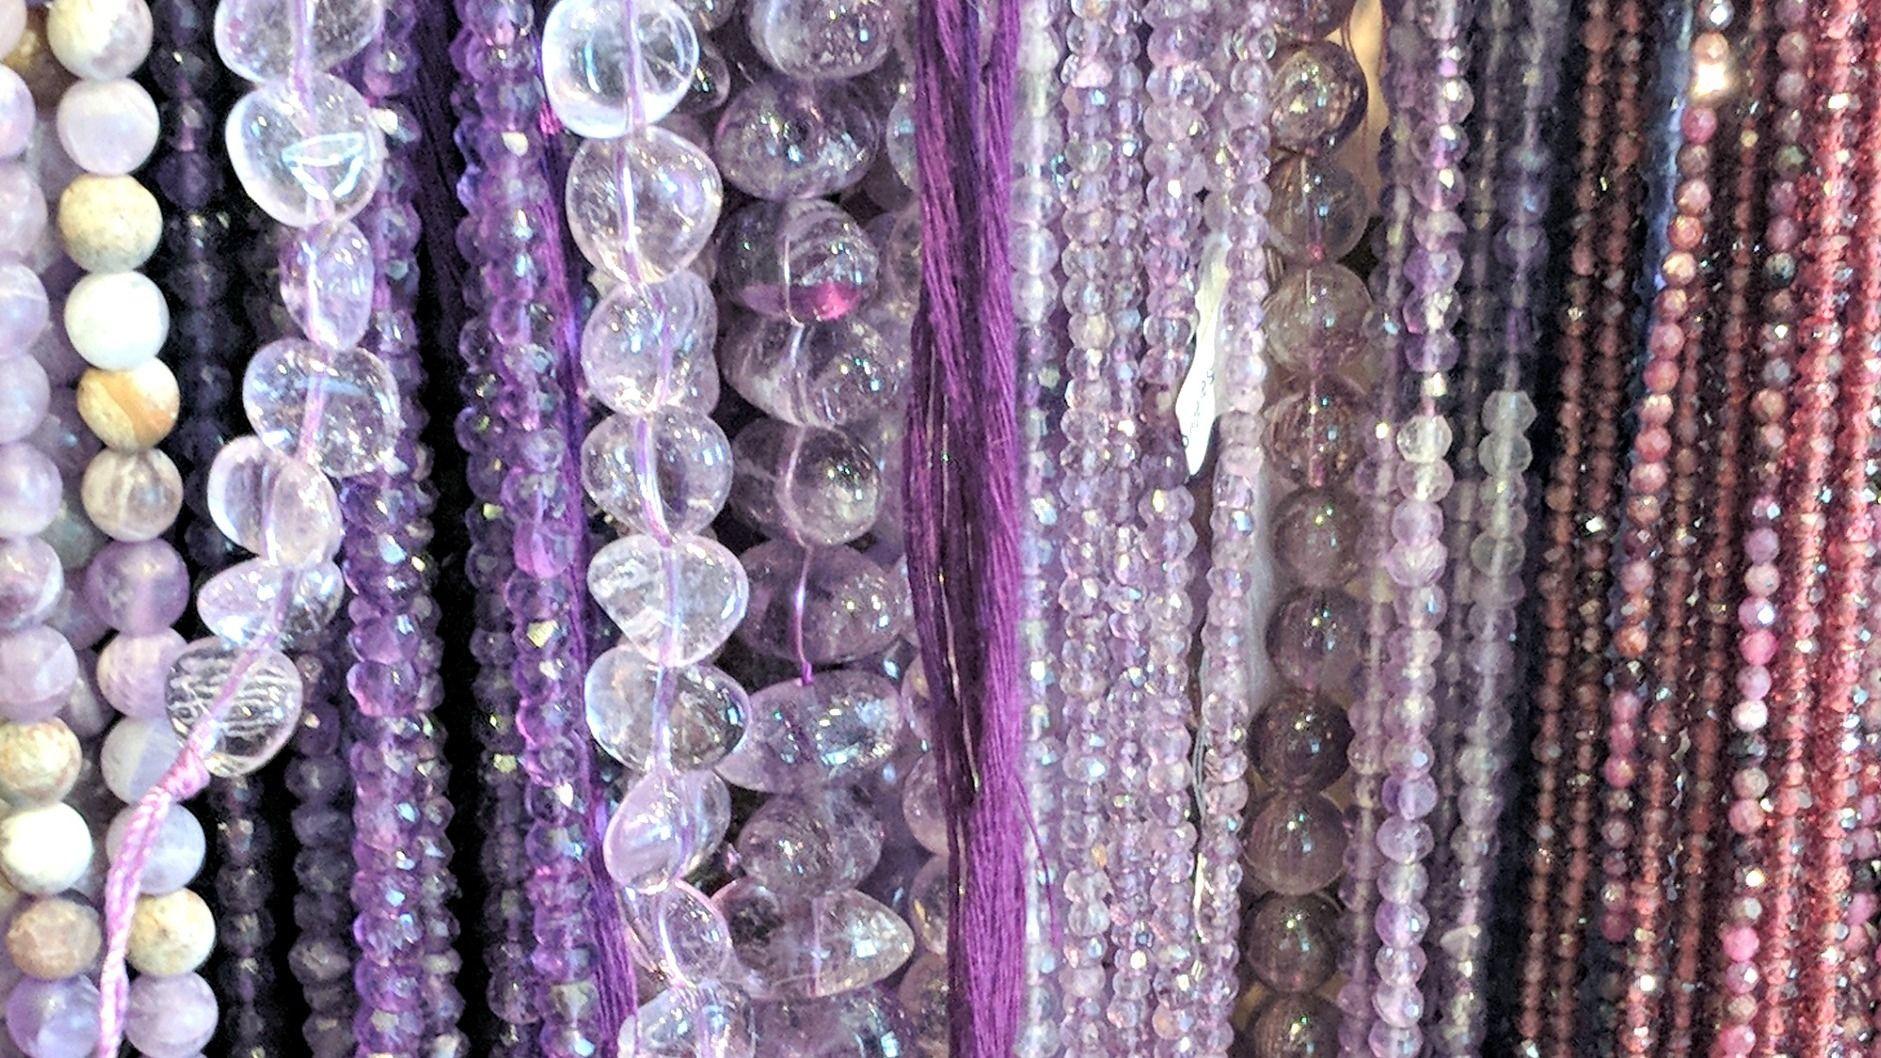 Nomad Bead Merchants: Boulder jewelry making & classes